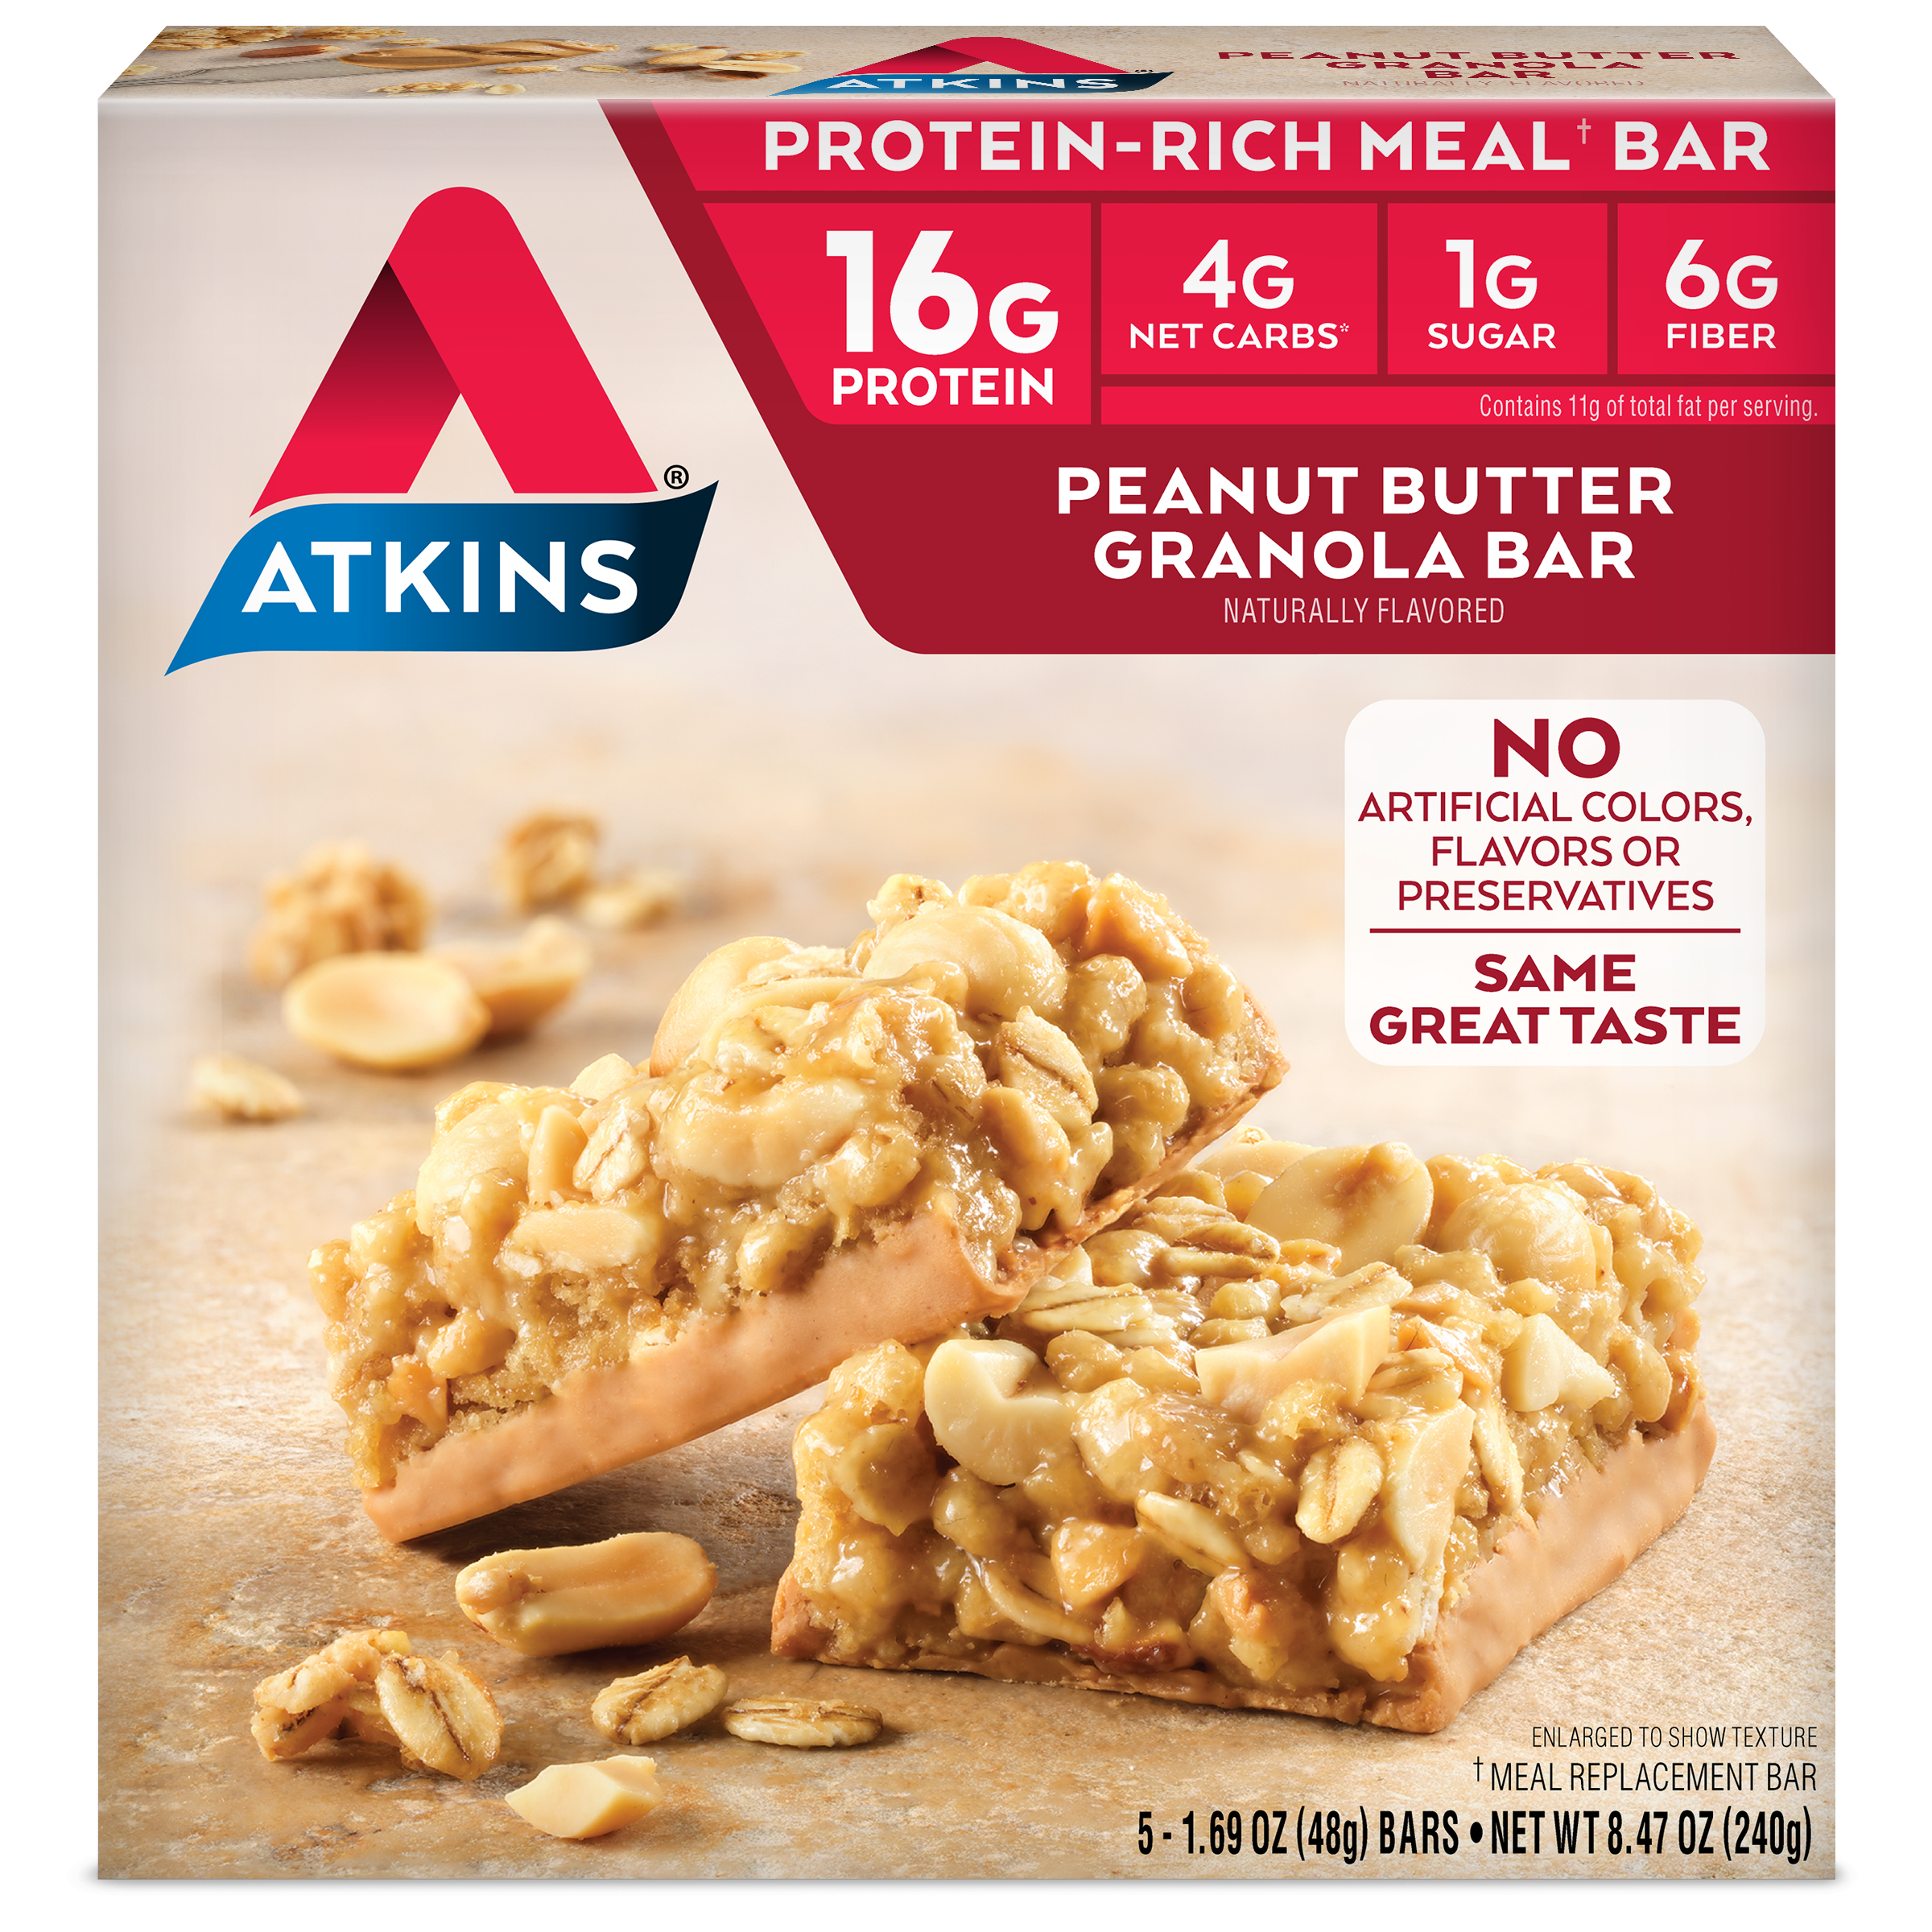 Atkins Peanut Butter Granola Bar, 1.7 oz, 5-pack (Meal Replacement)